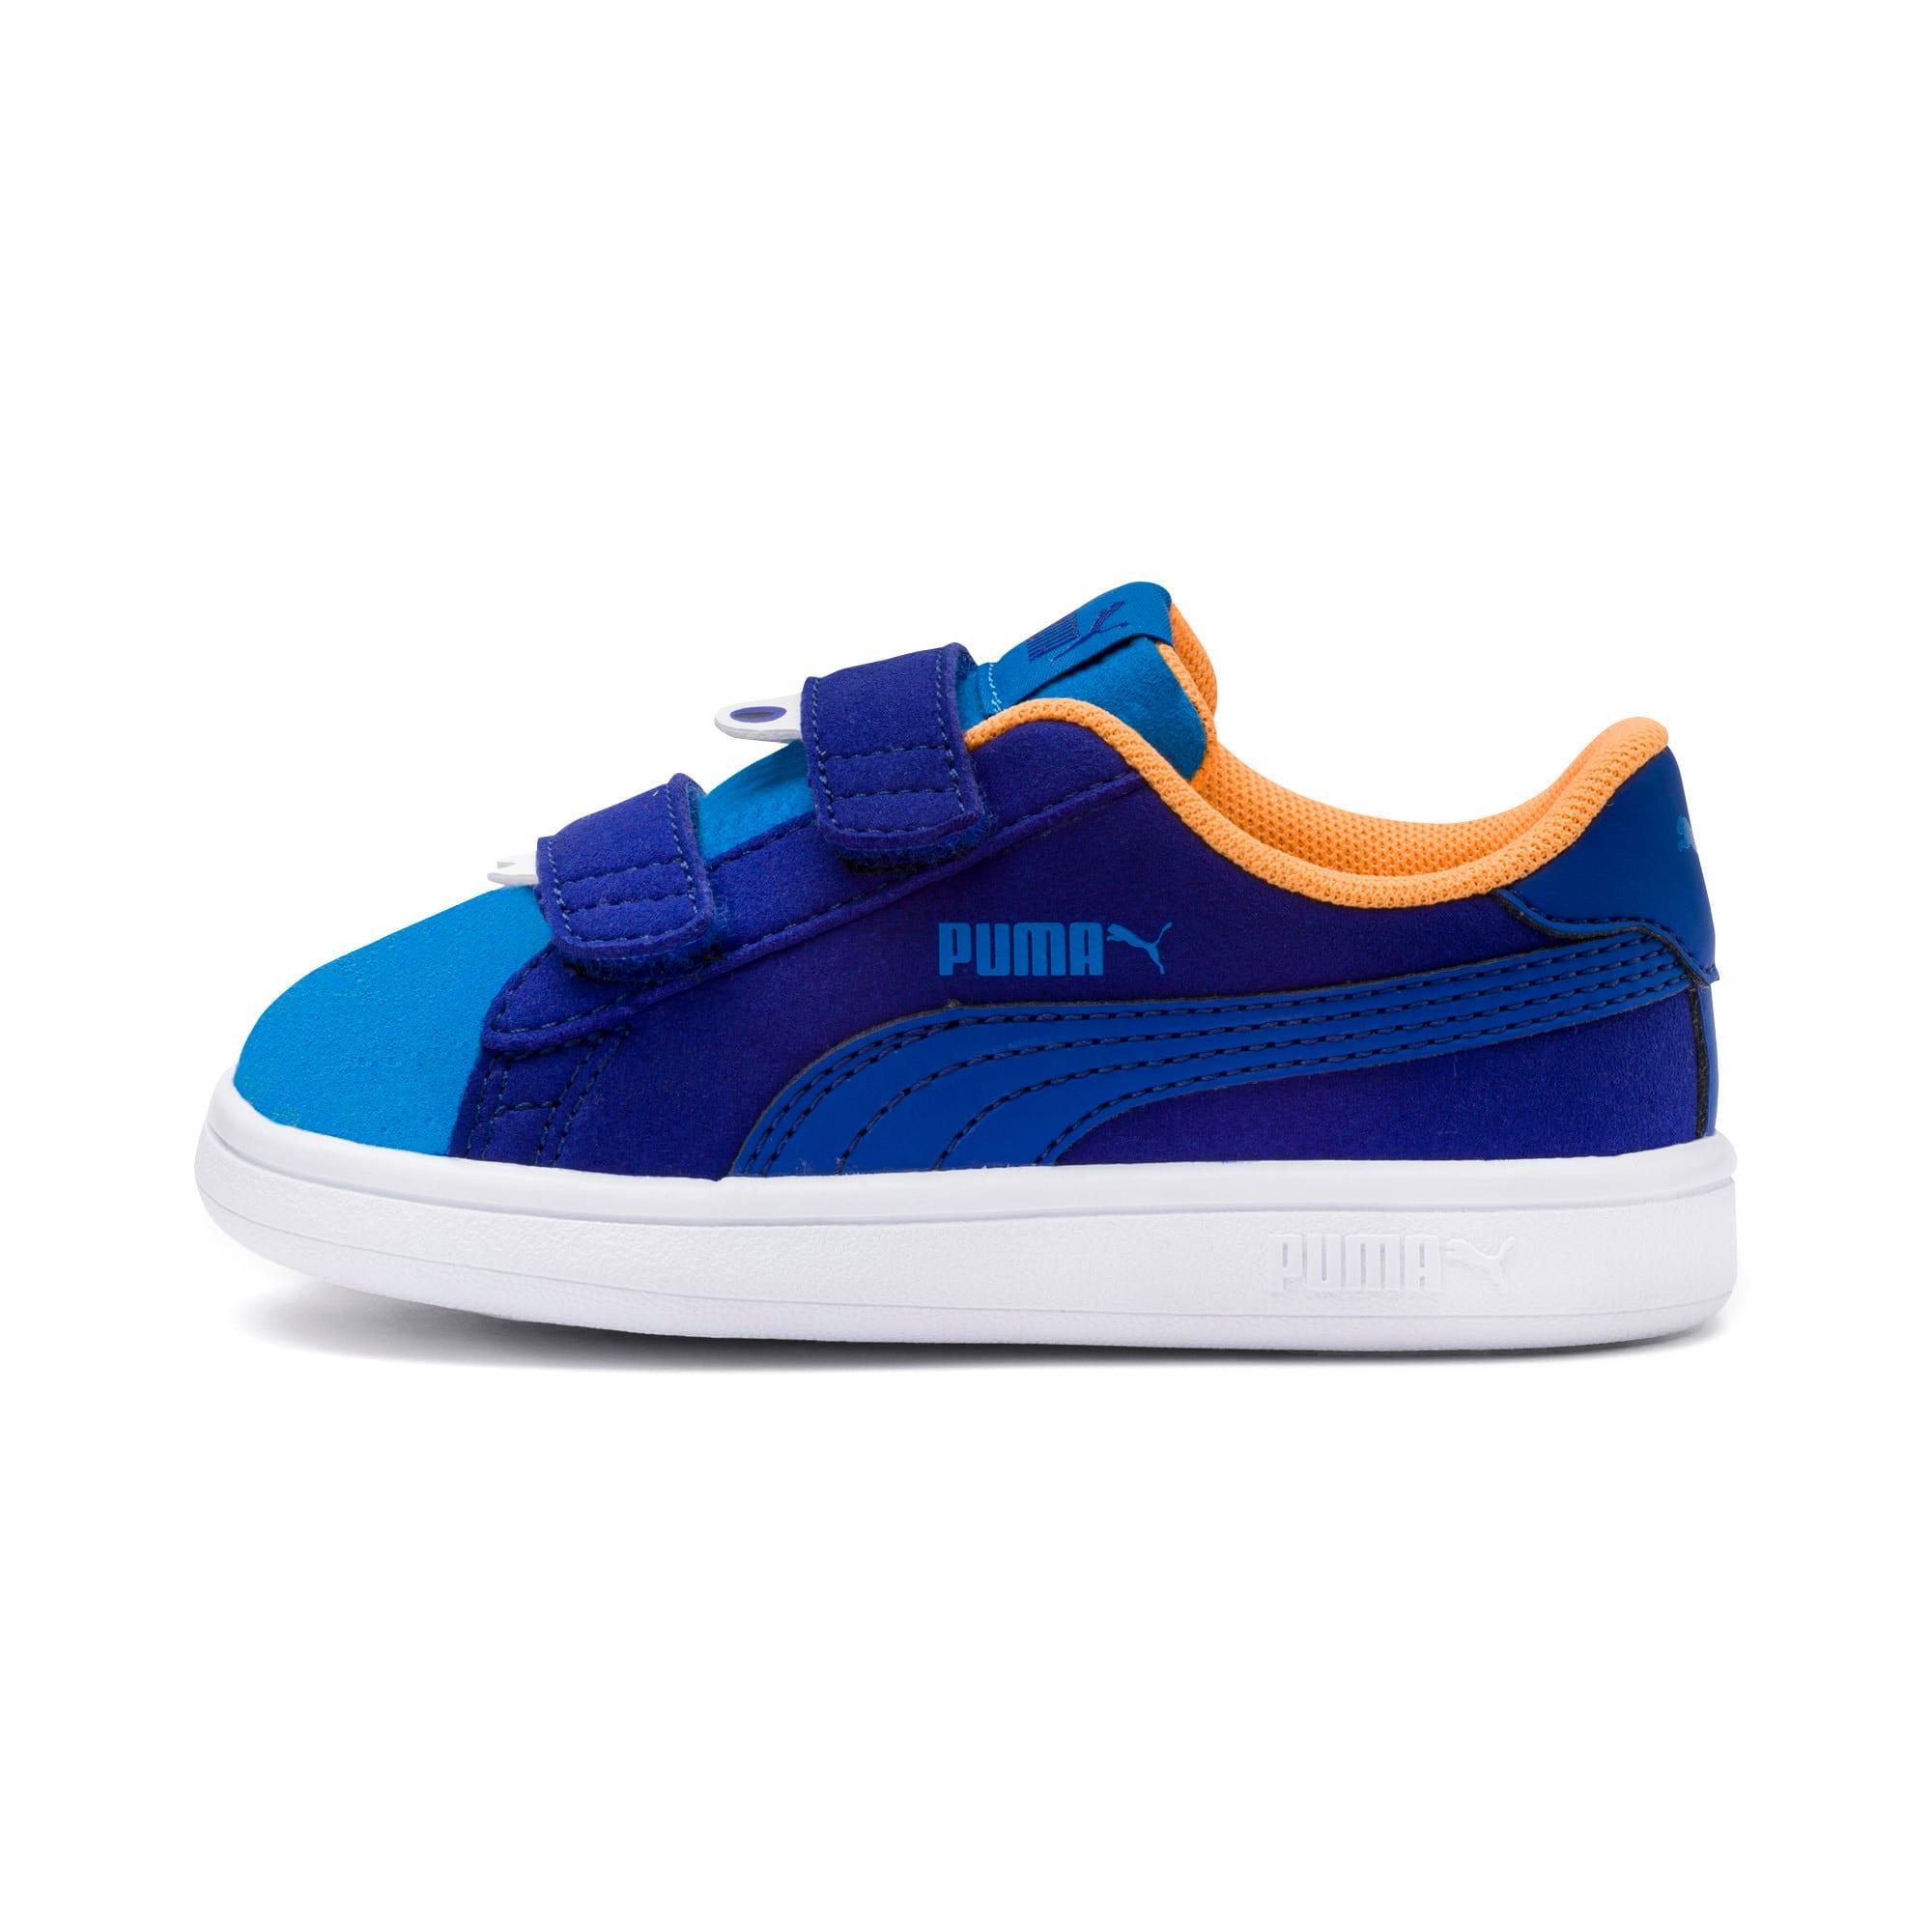 Thumbnail 1 of PUMA Smash v2 Monster Little Kids' Shoes, Sf Th Wb-I Bunting-Ornge-Wht, medium